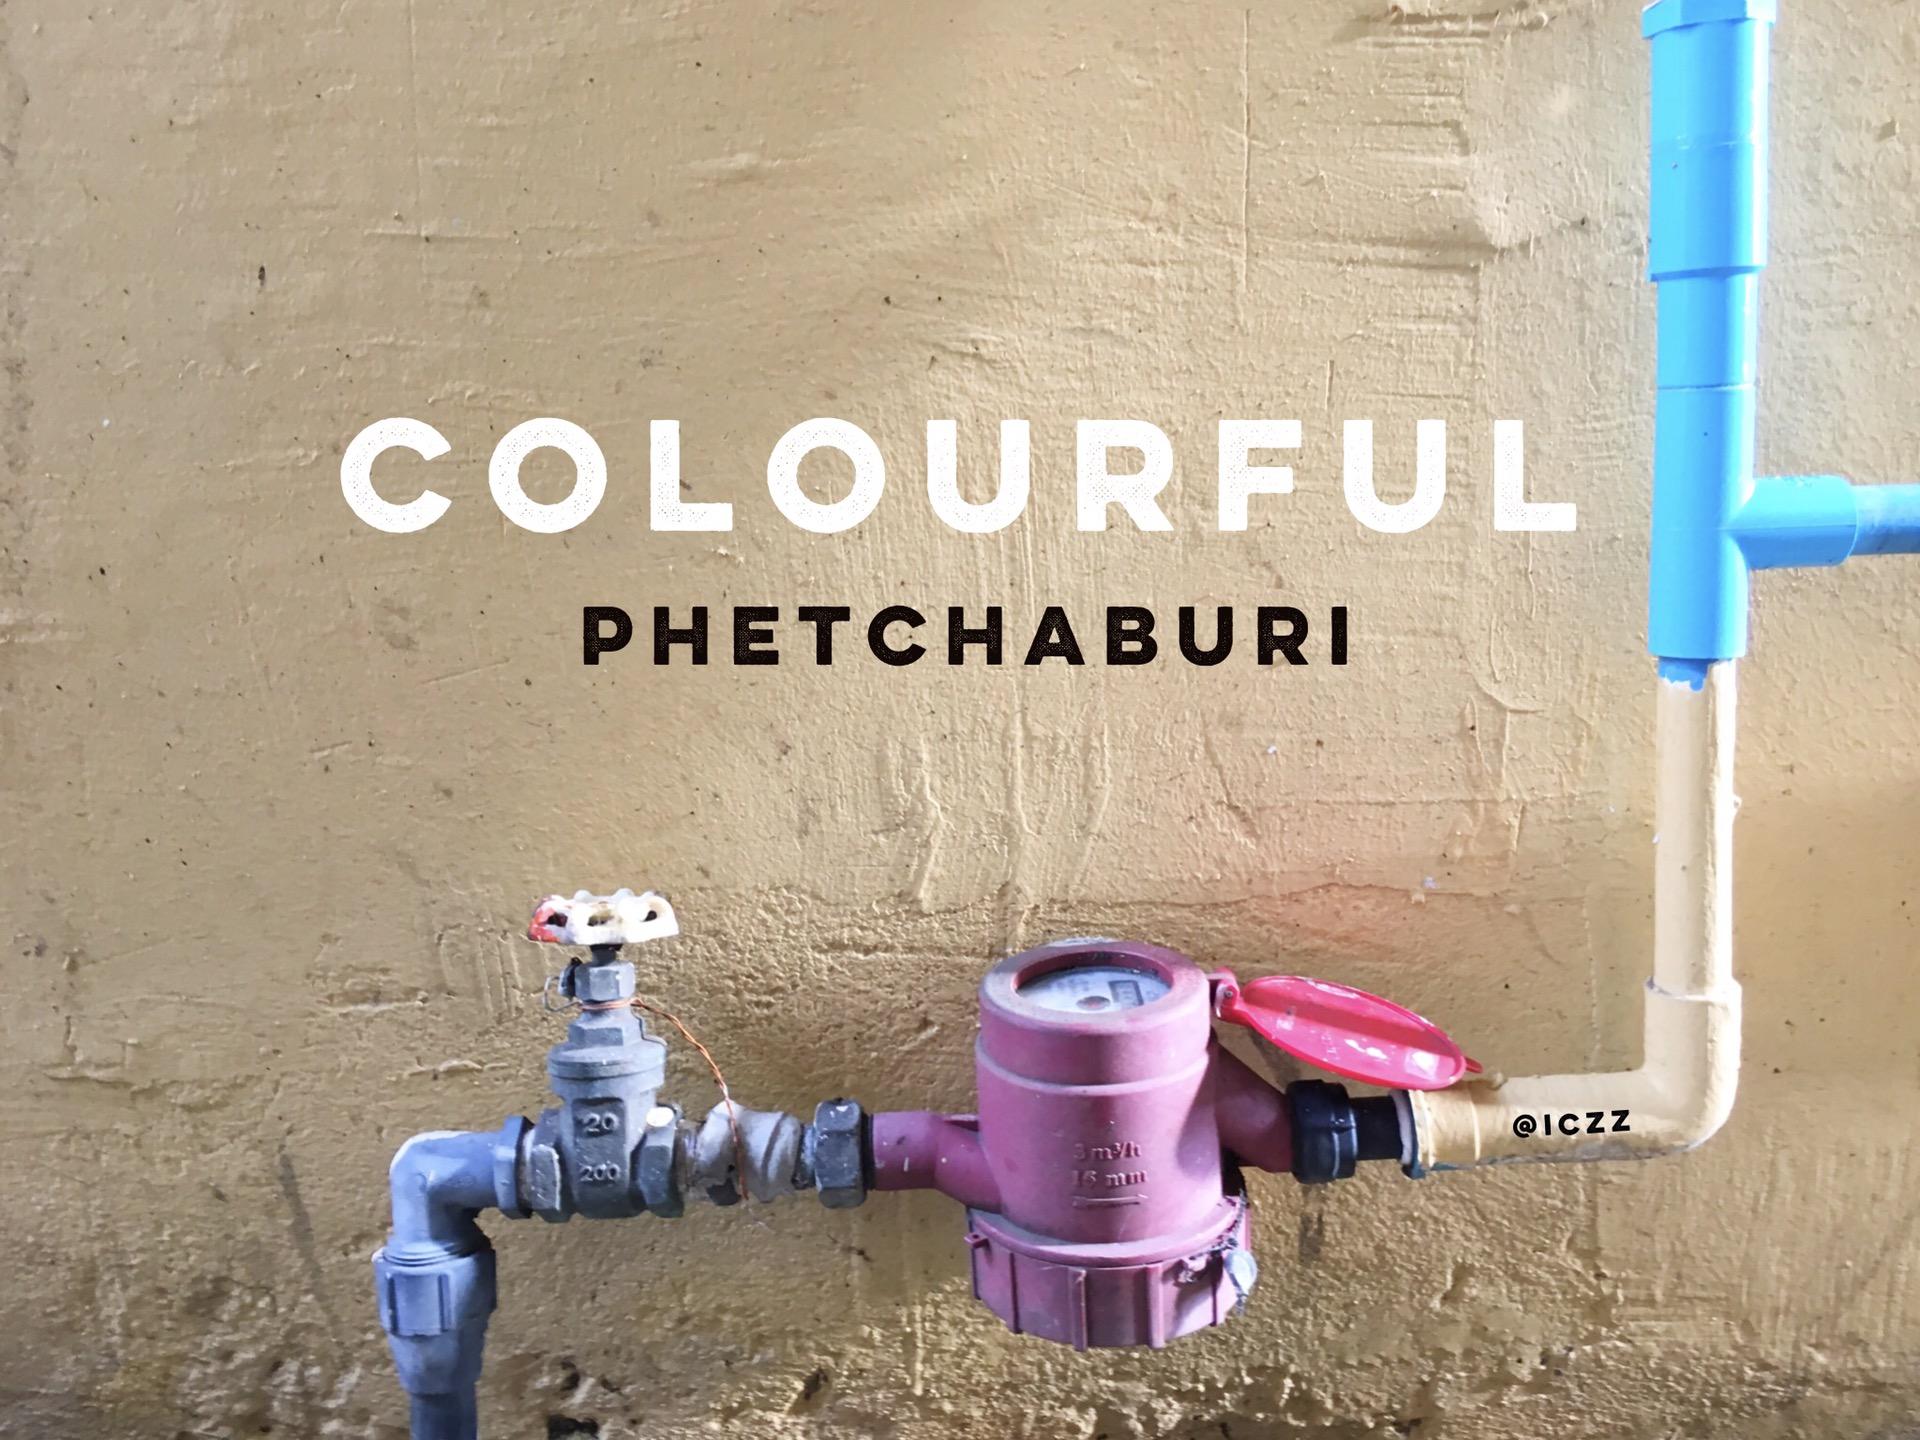 Colourful Phetchaburi :: รีวิว เที่ยวเมืองเพชร จ.เพชรบุรี